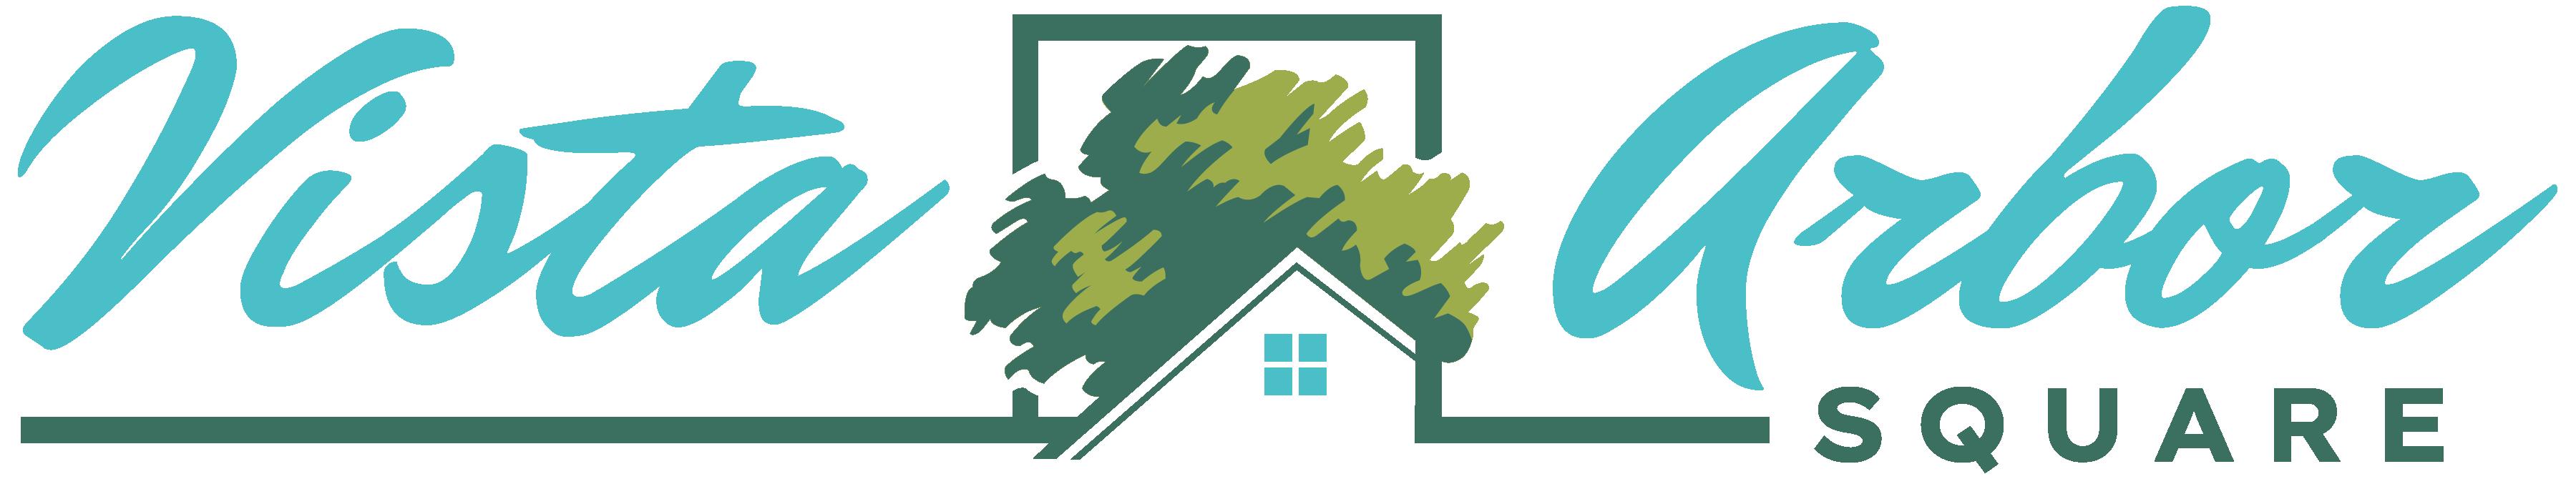 Vista Arbor Square Logo